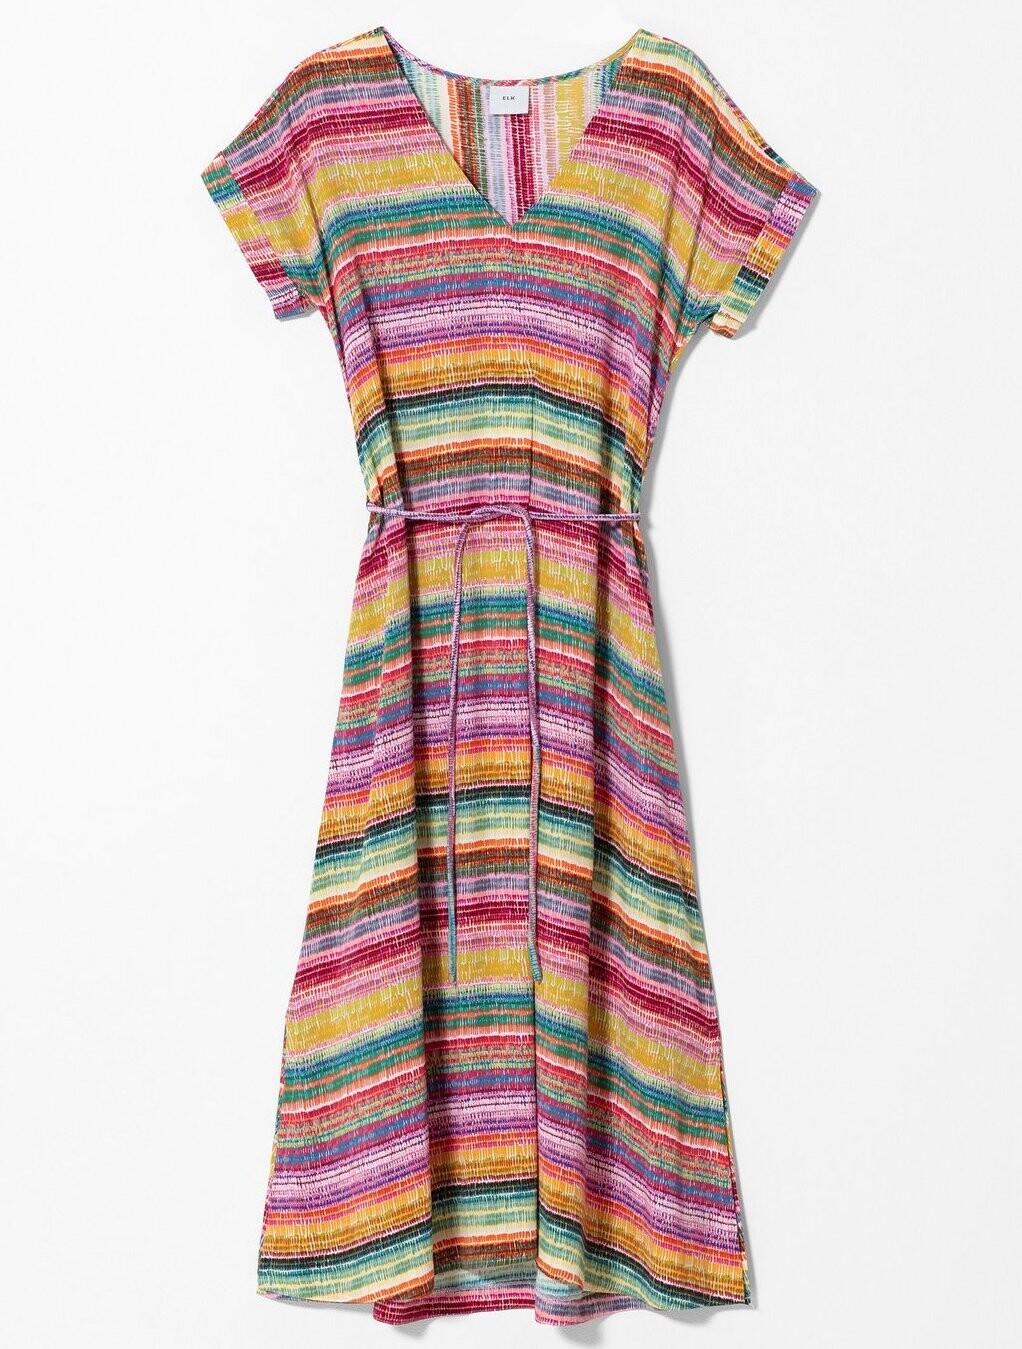 ELK Essen Dress - Artist Print